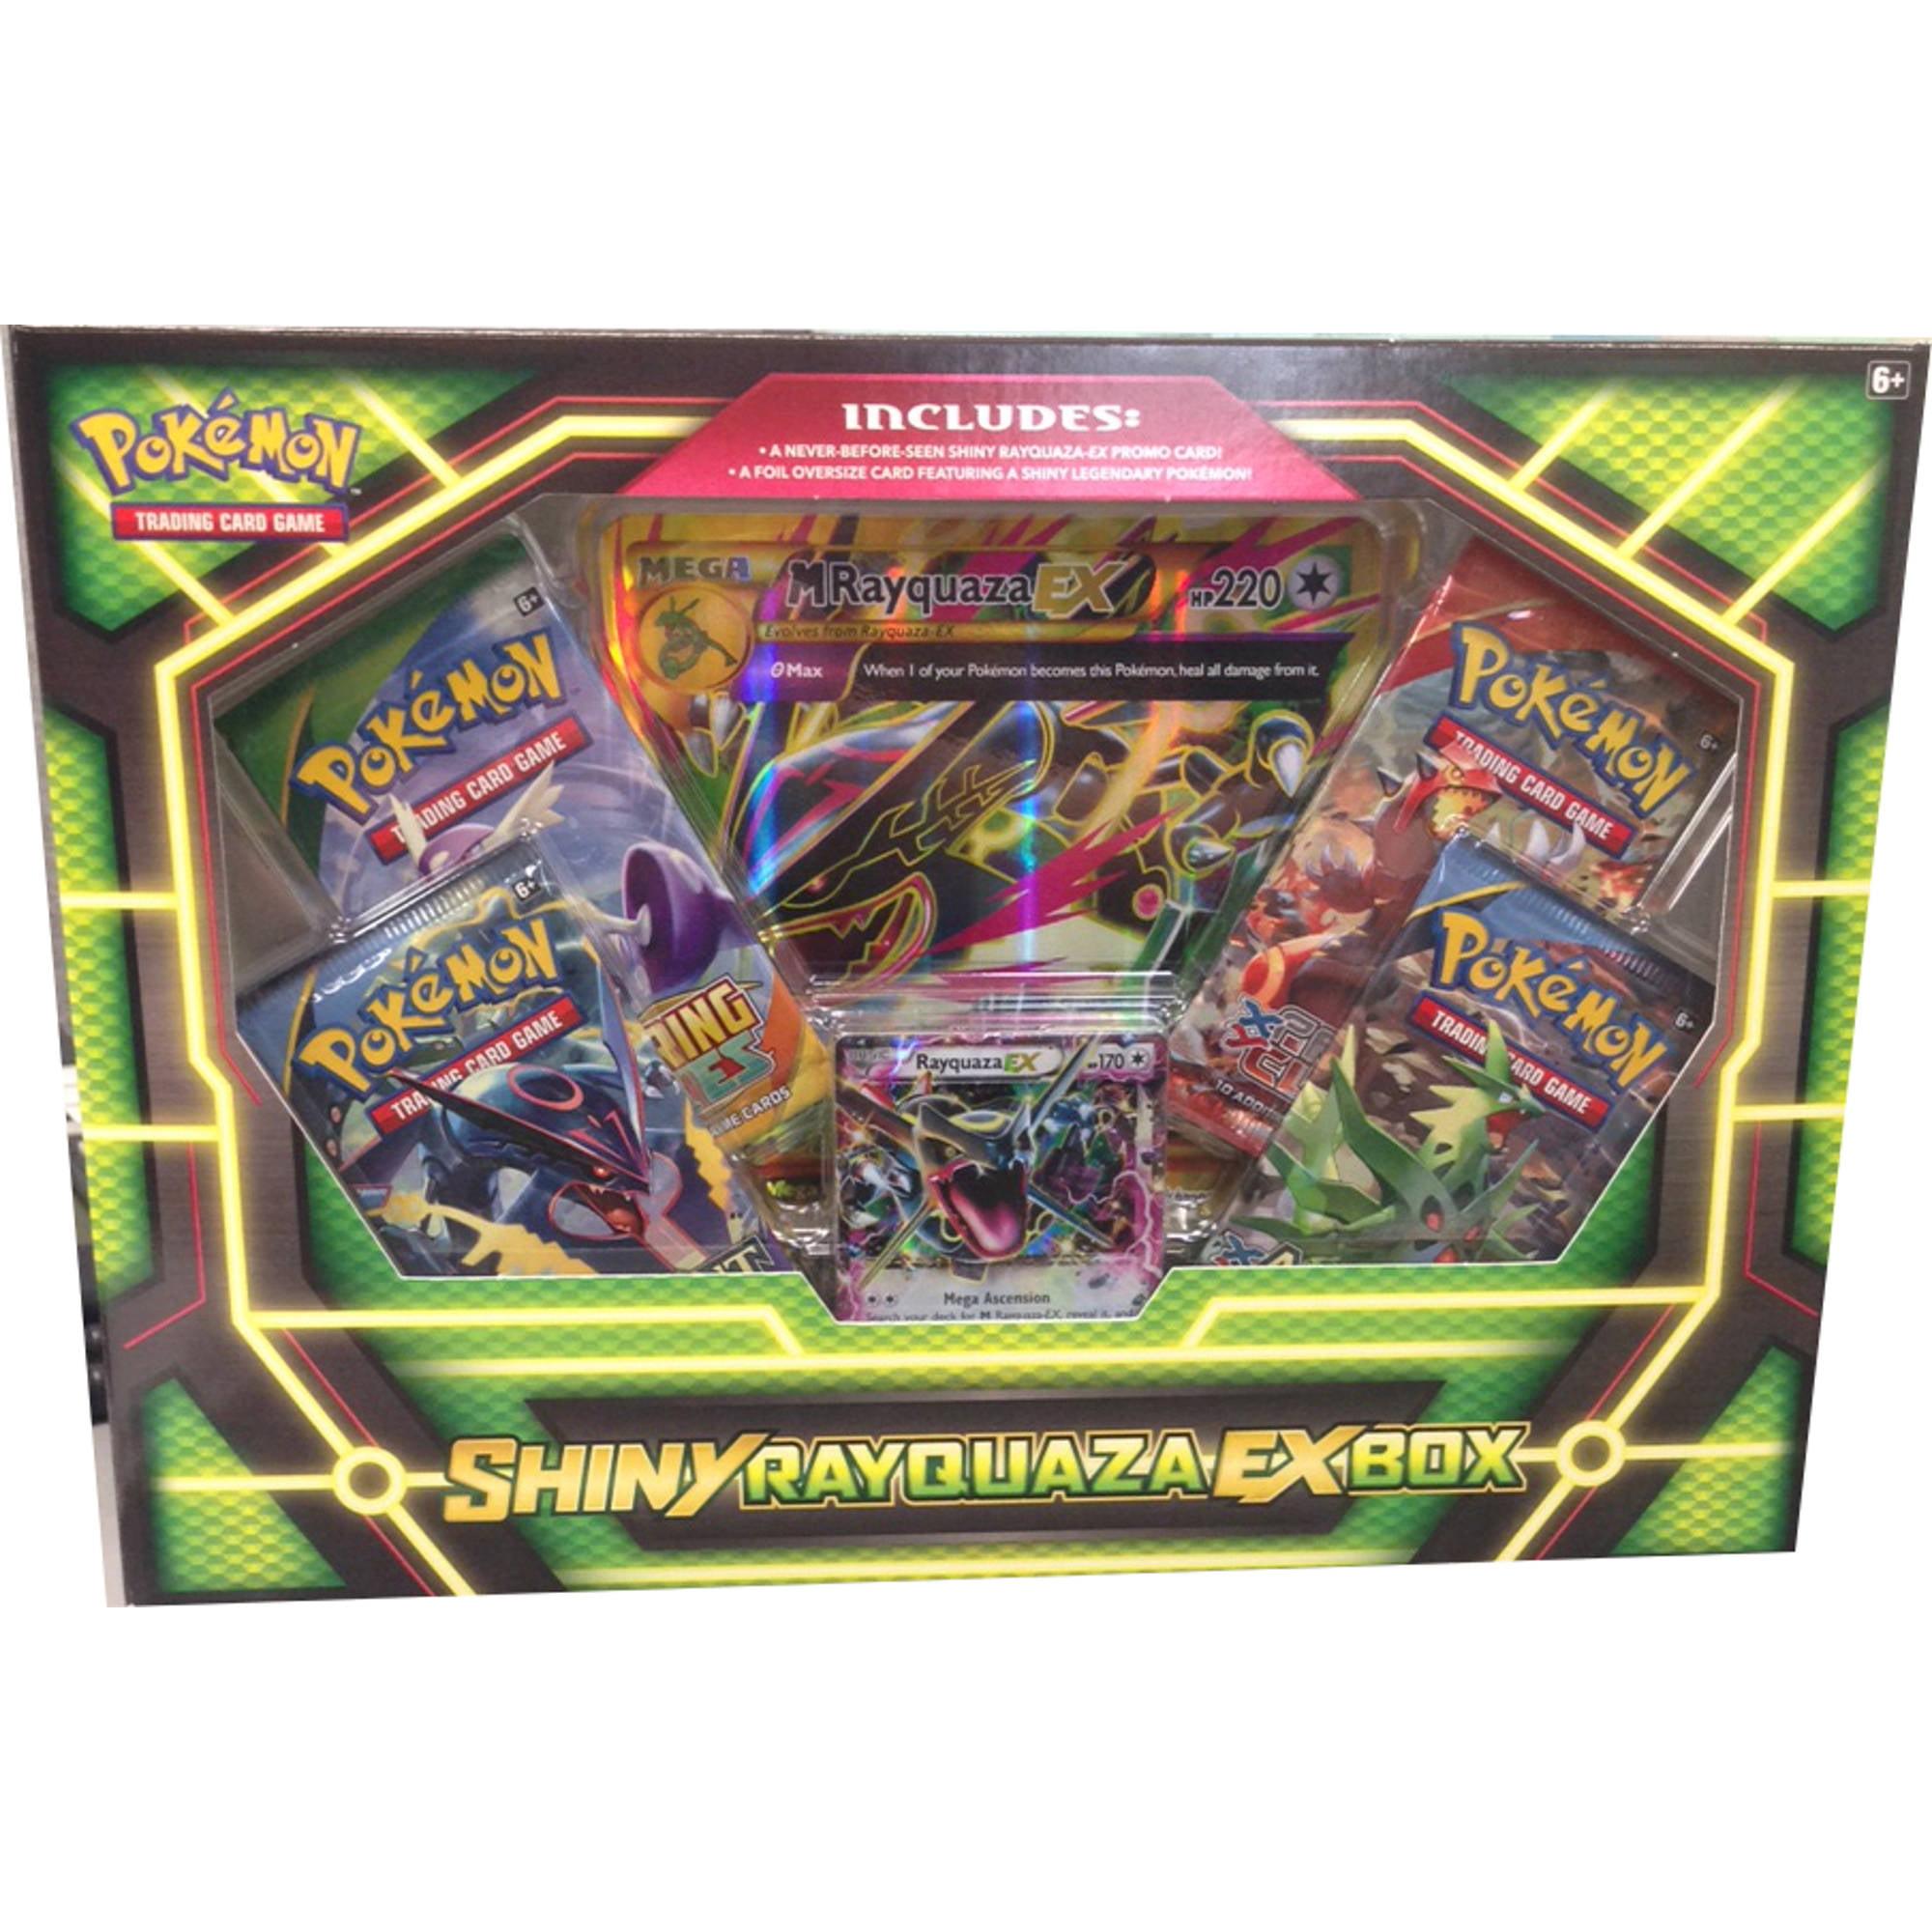 Pokemon Shiny Rayquaza Ex Box - Walmart.com